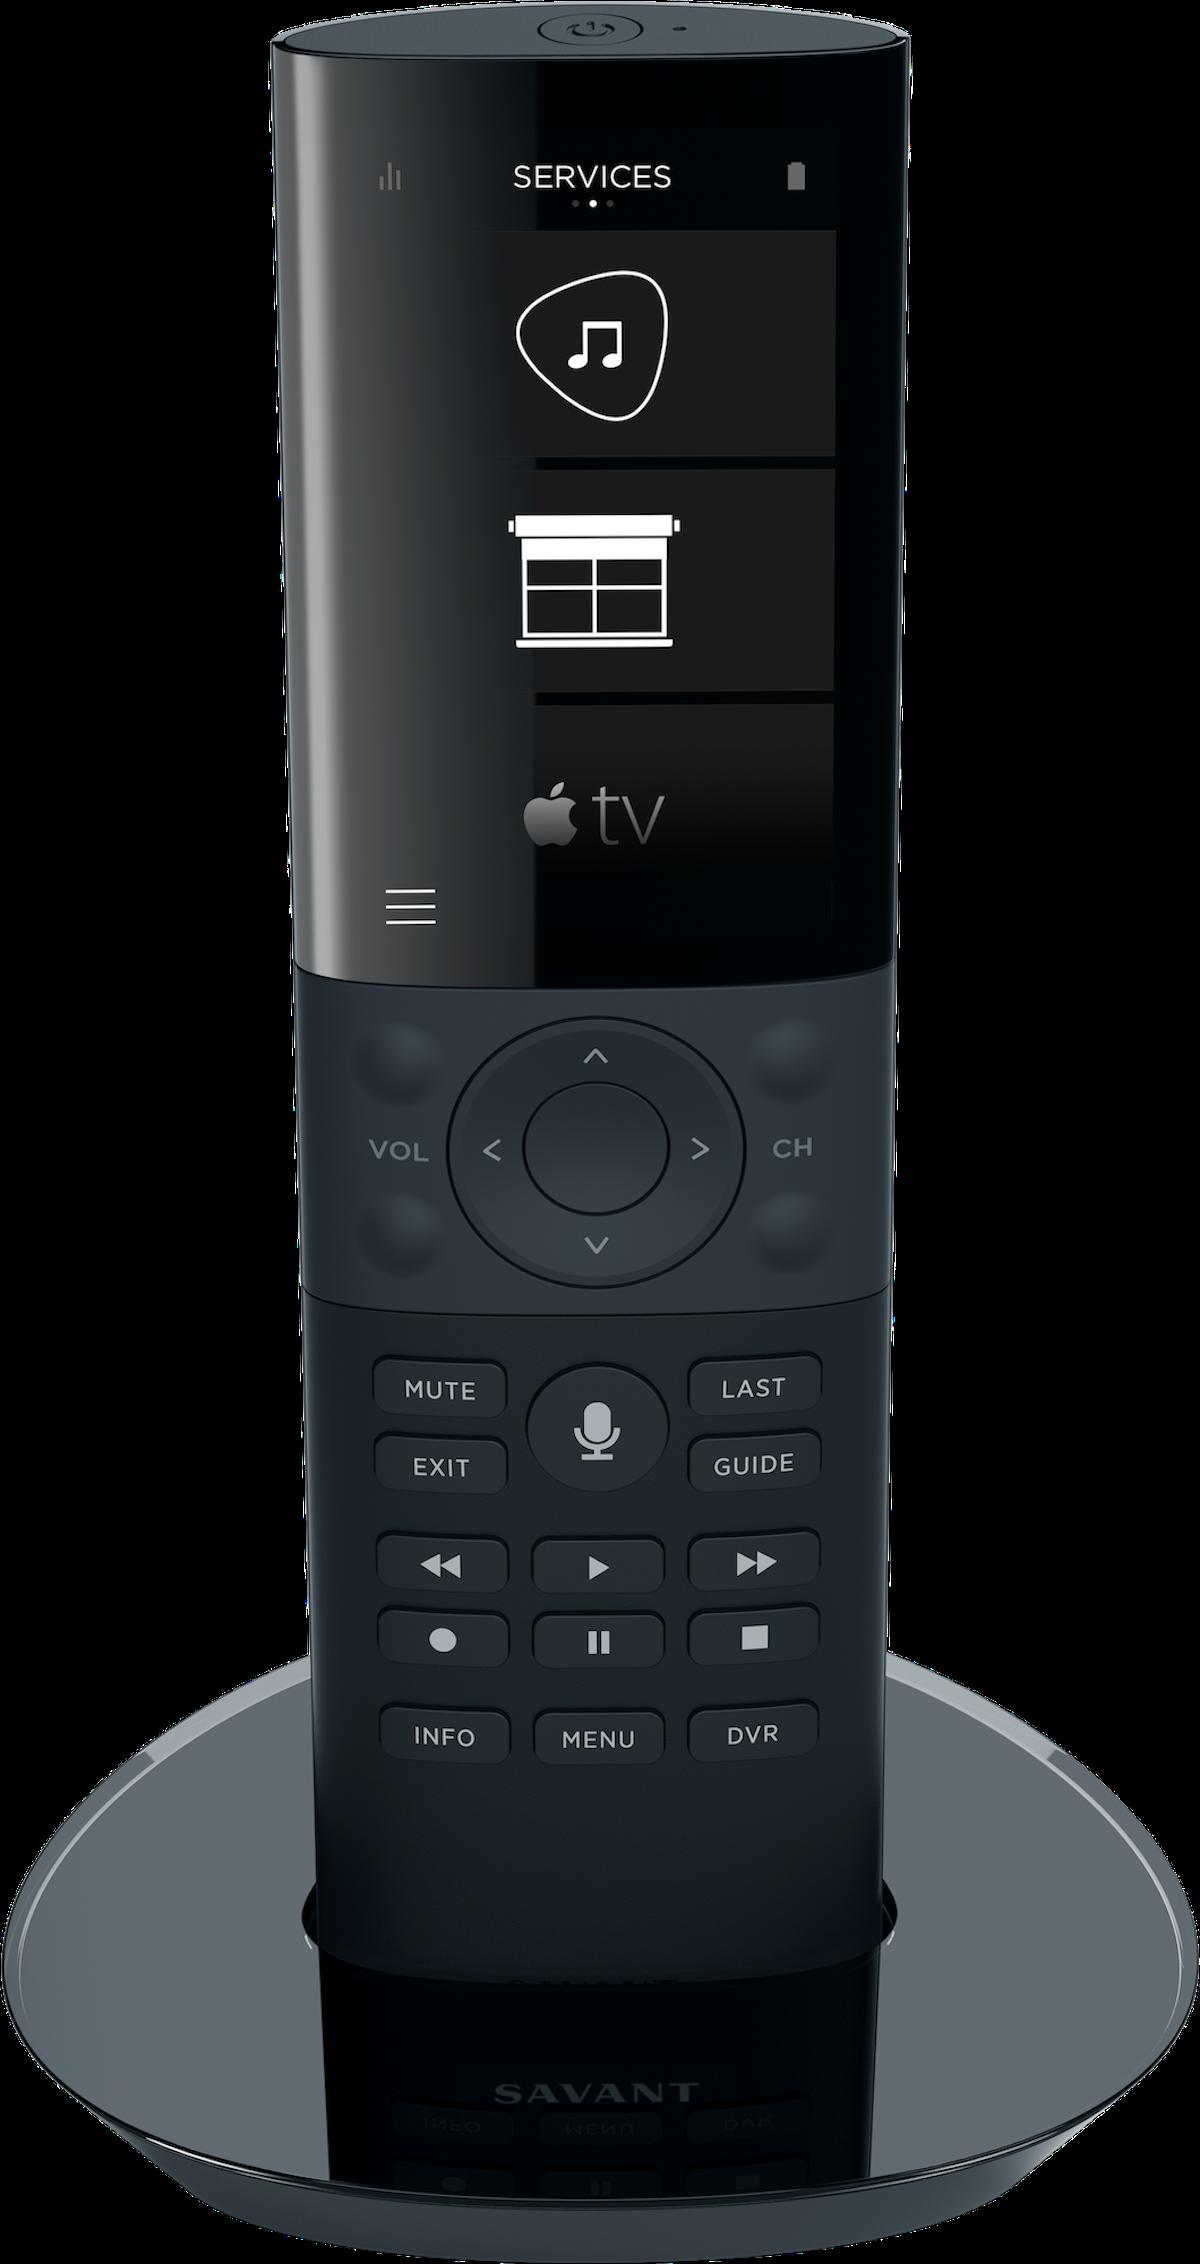 Savant Universal Remote SAV-REM-0100-01 Black